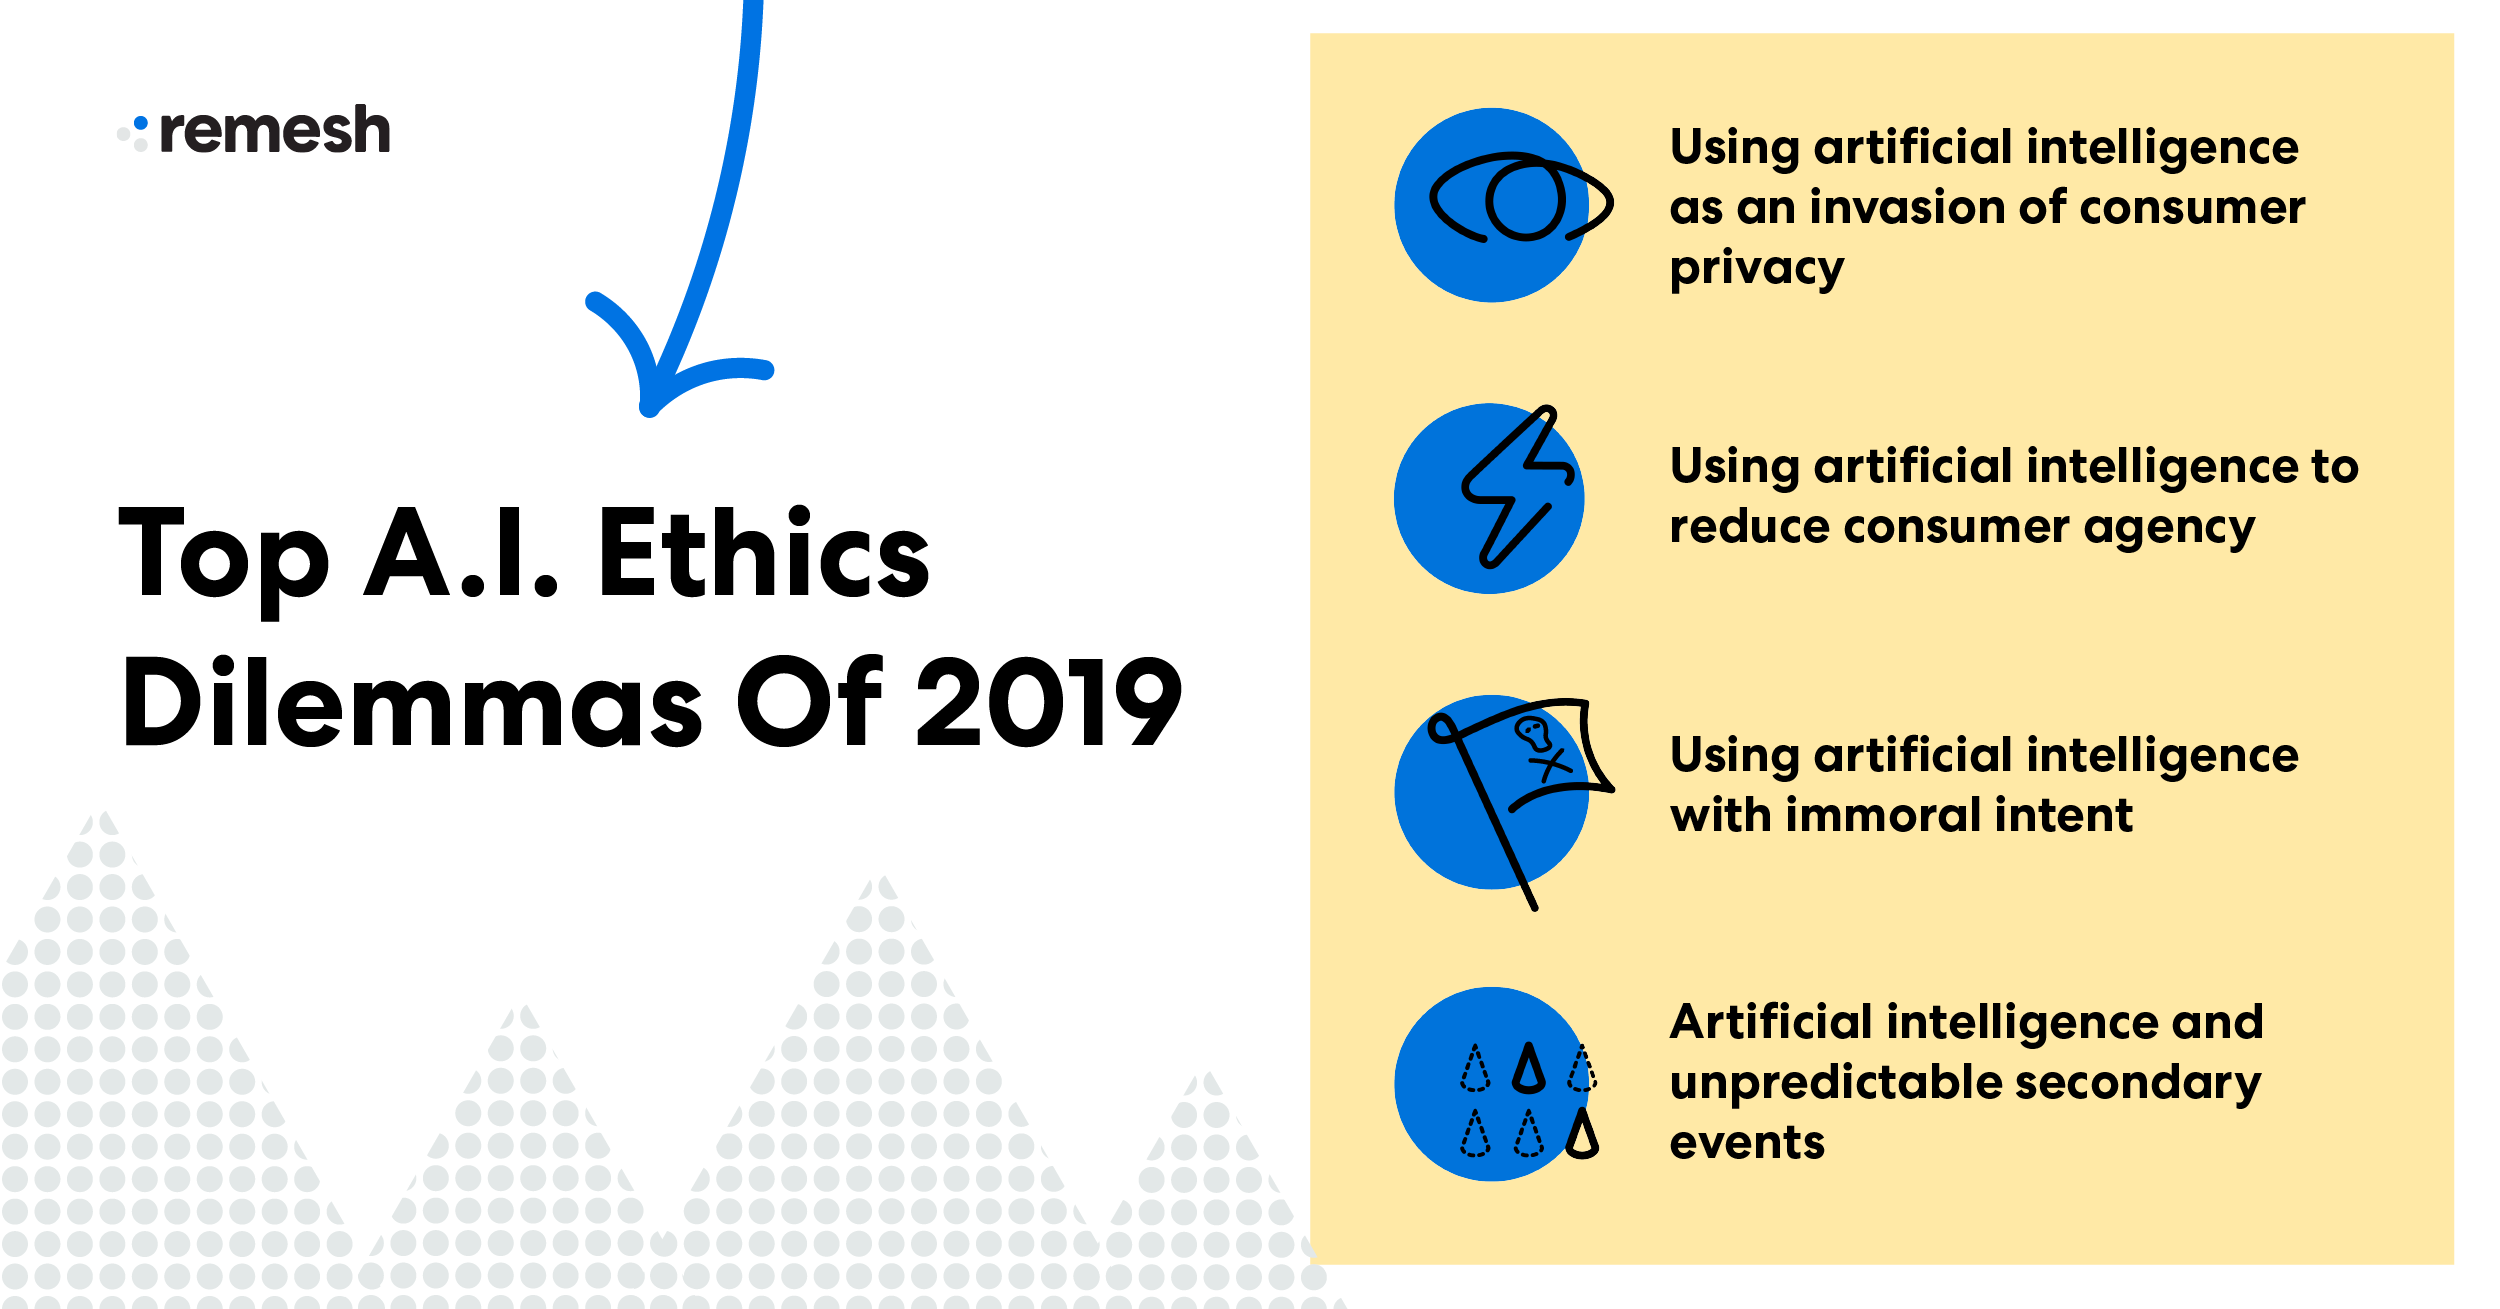 a.i. ethics dilemmas 2019